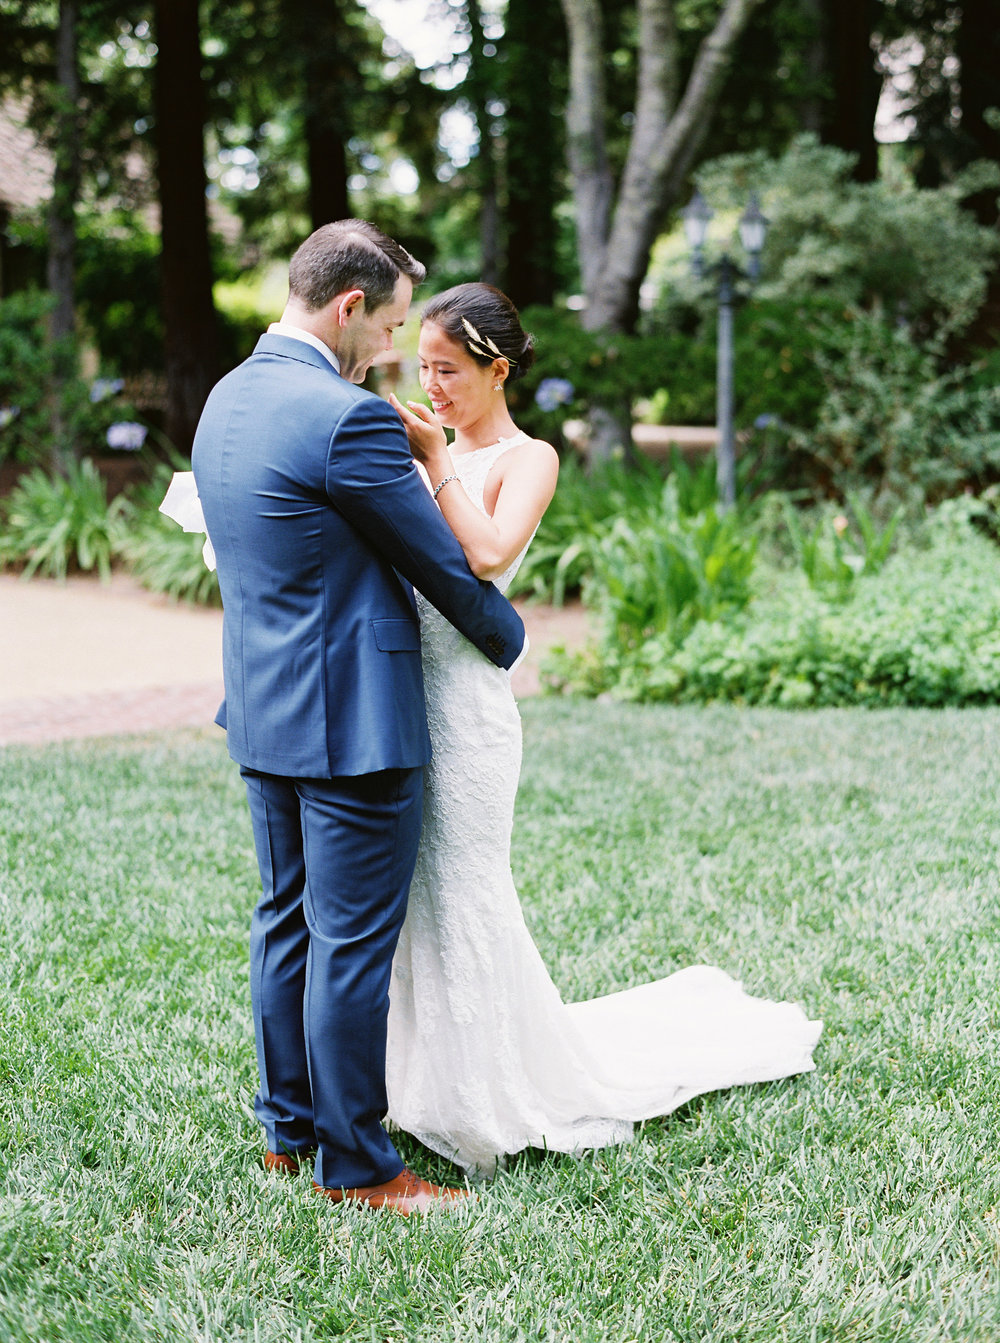 Harvest-inn-wedding-in-napa-california-254.jpg